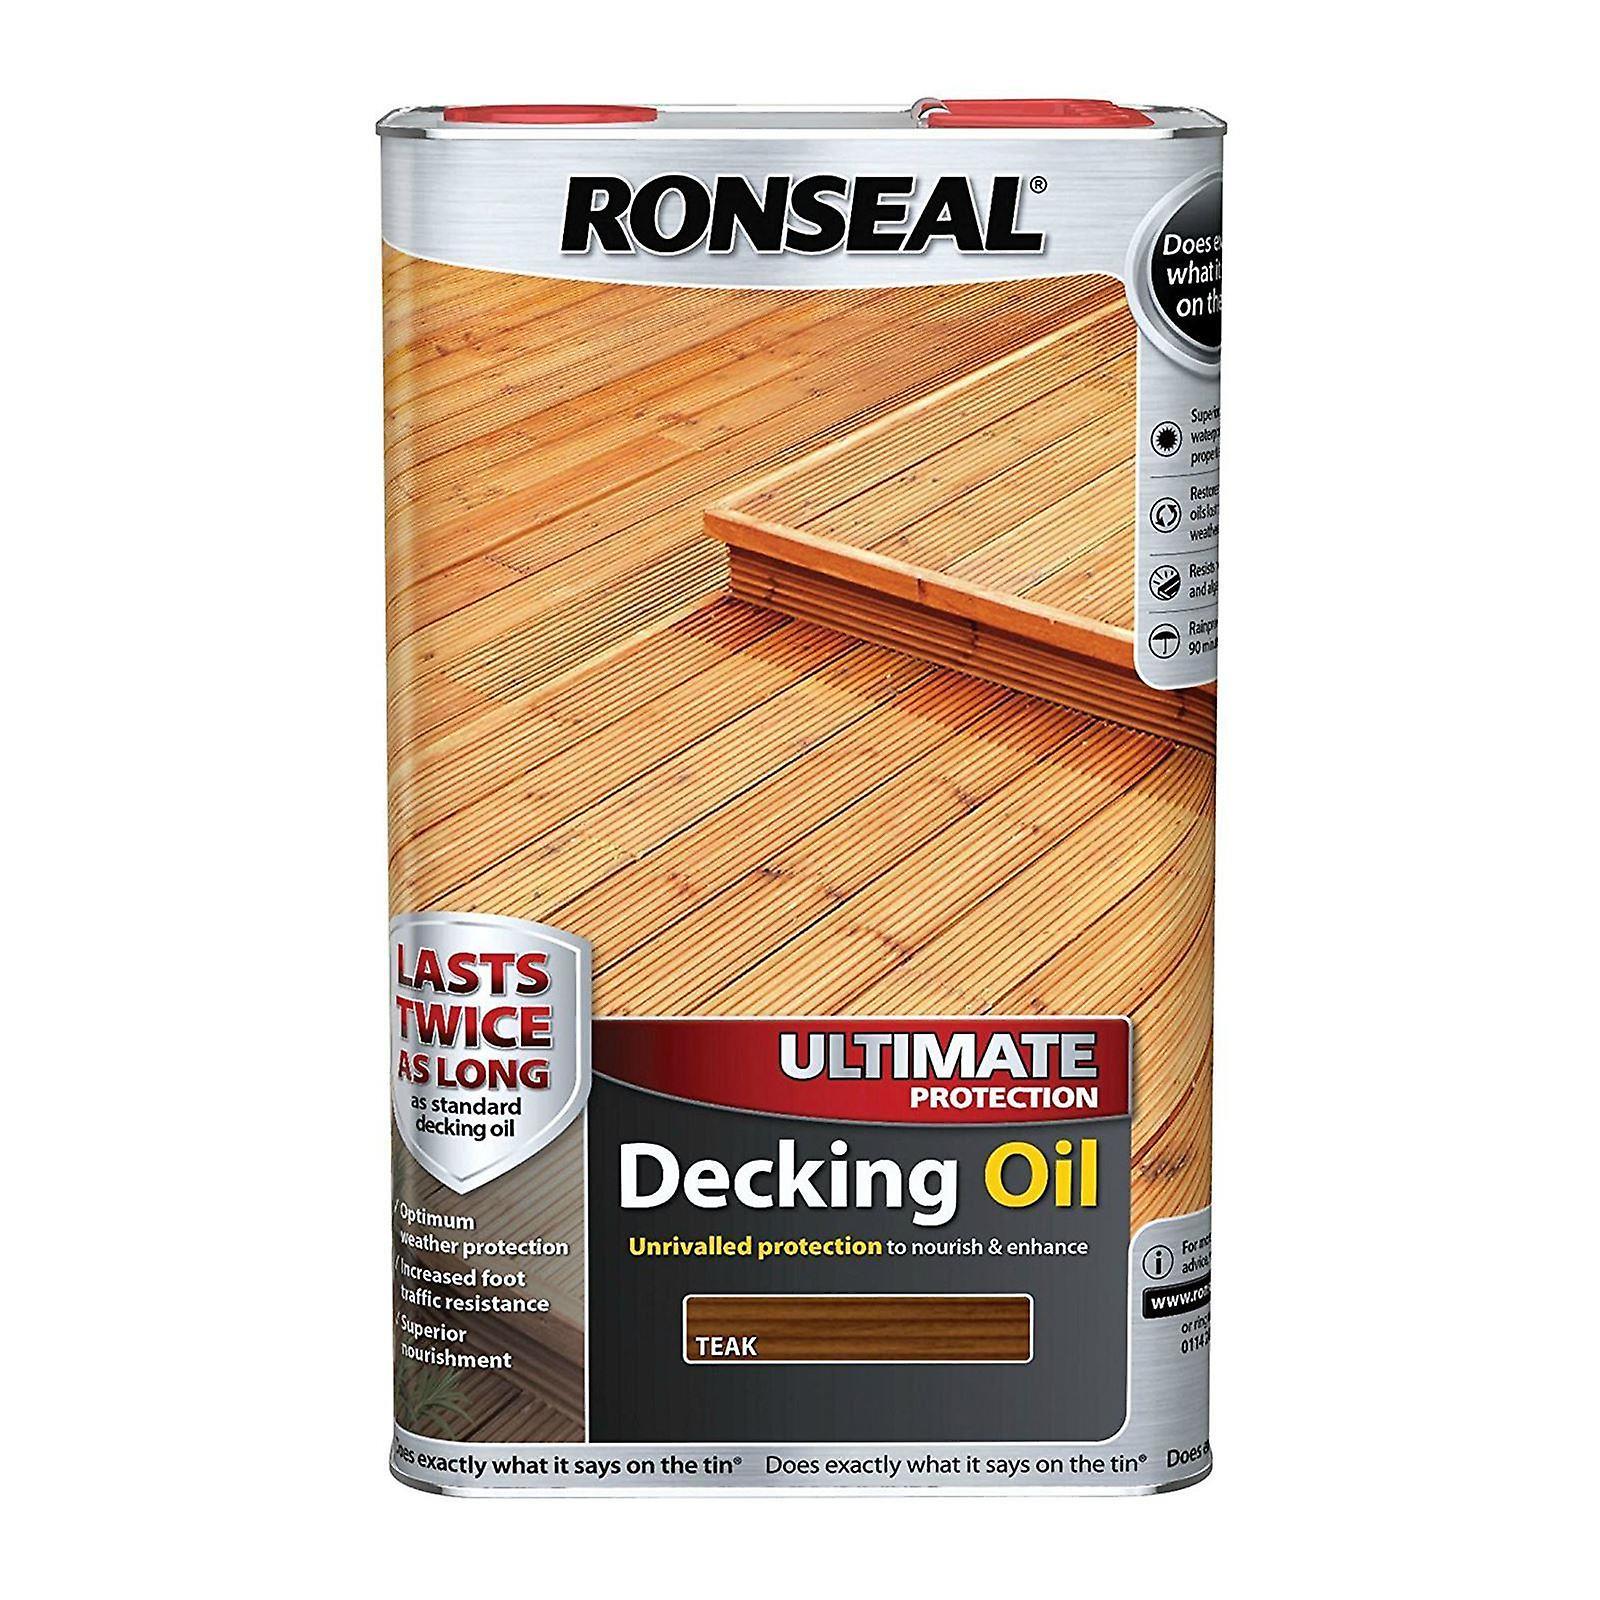 Ronseal Ultimate Protection Decking Oil 5 Litre - Teak